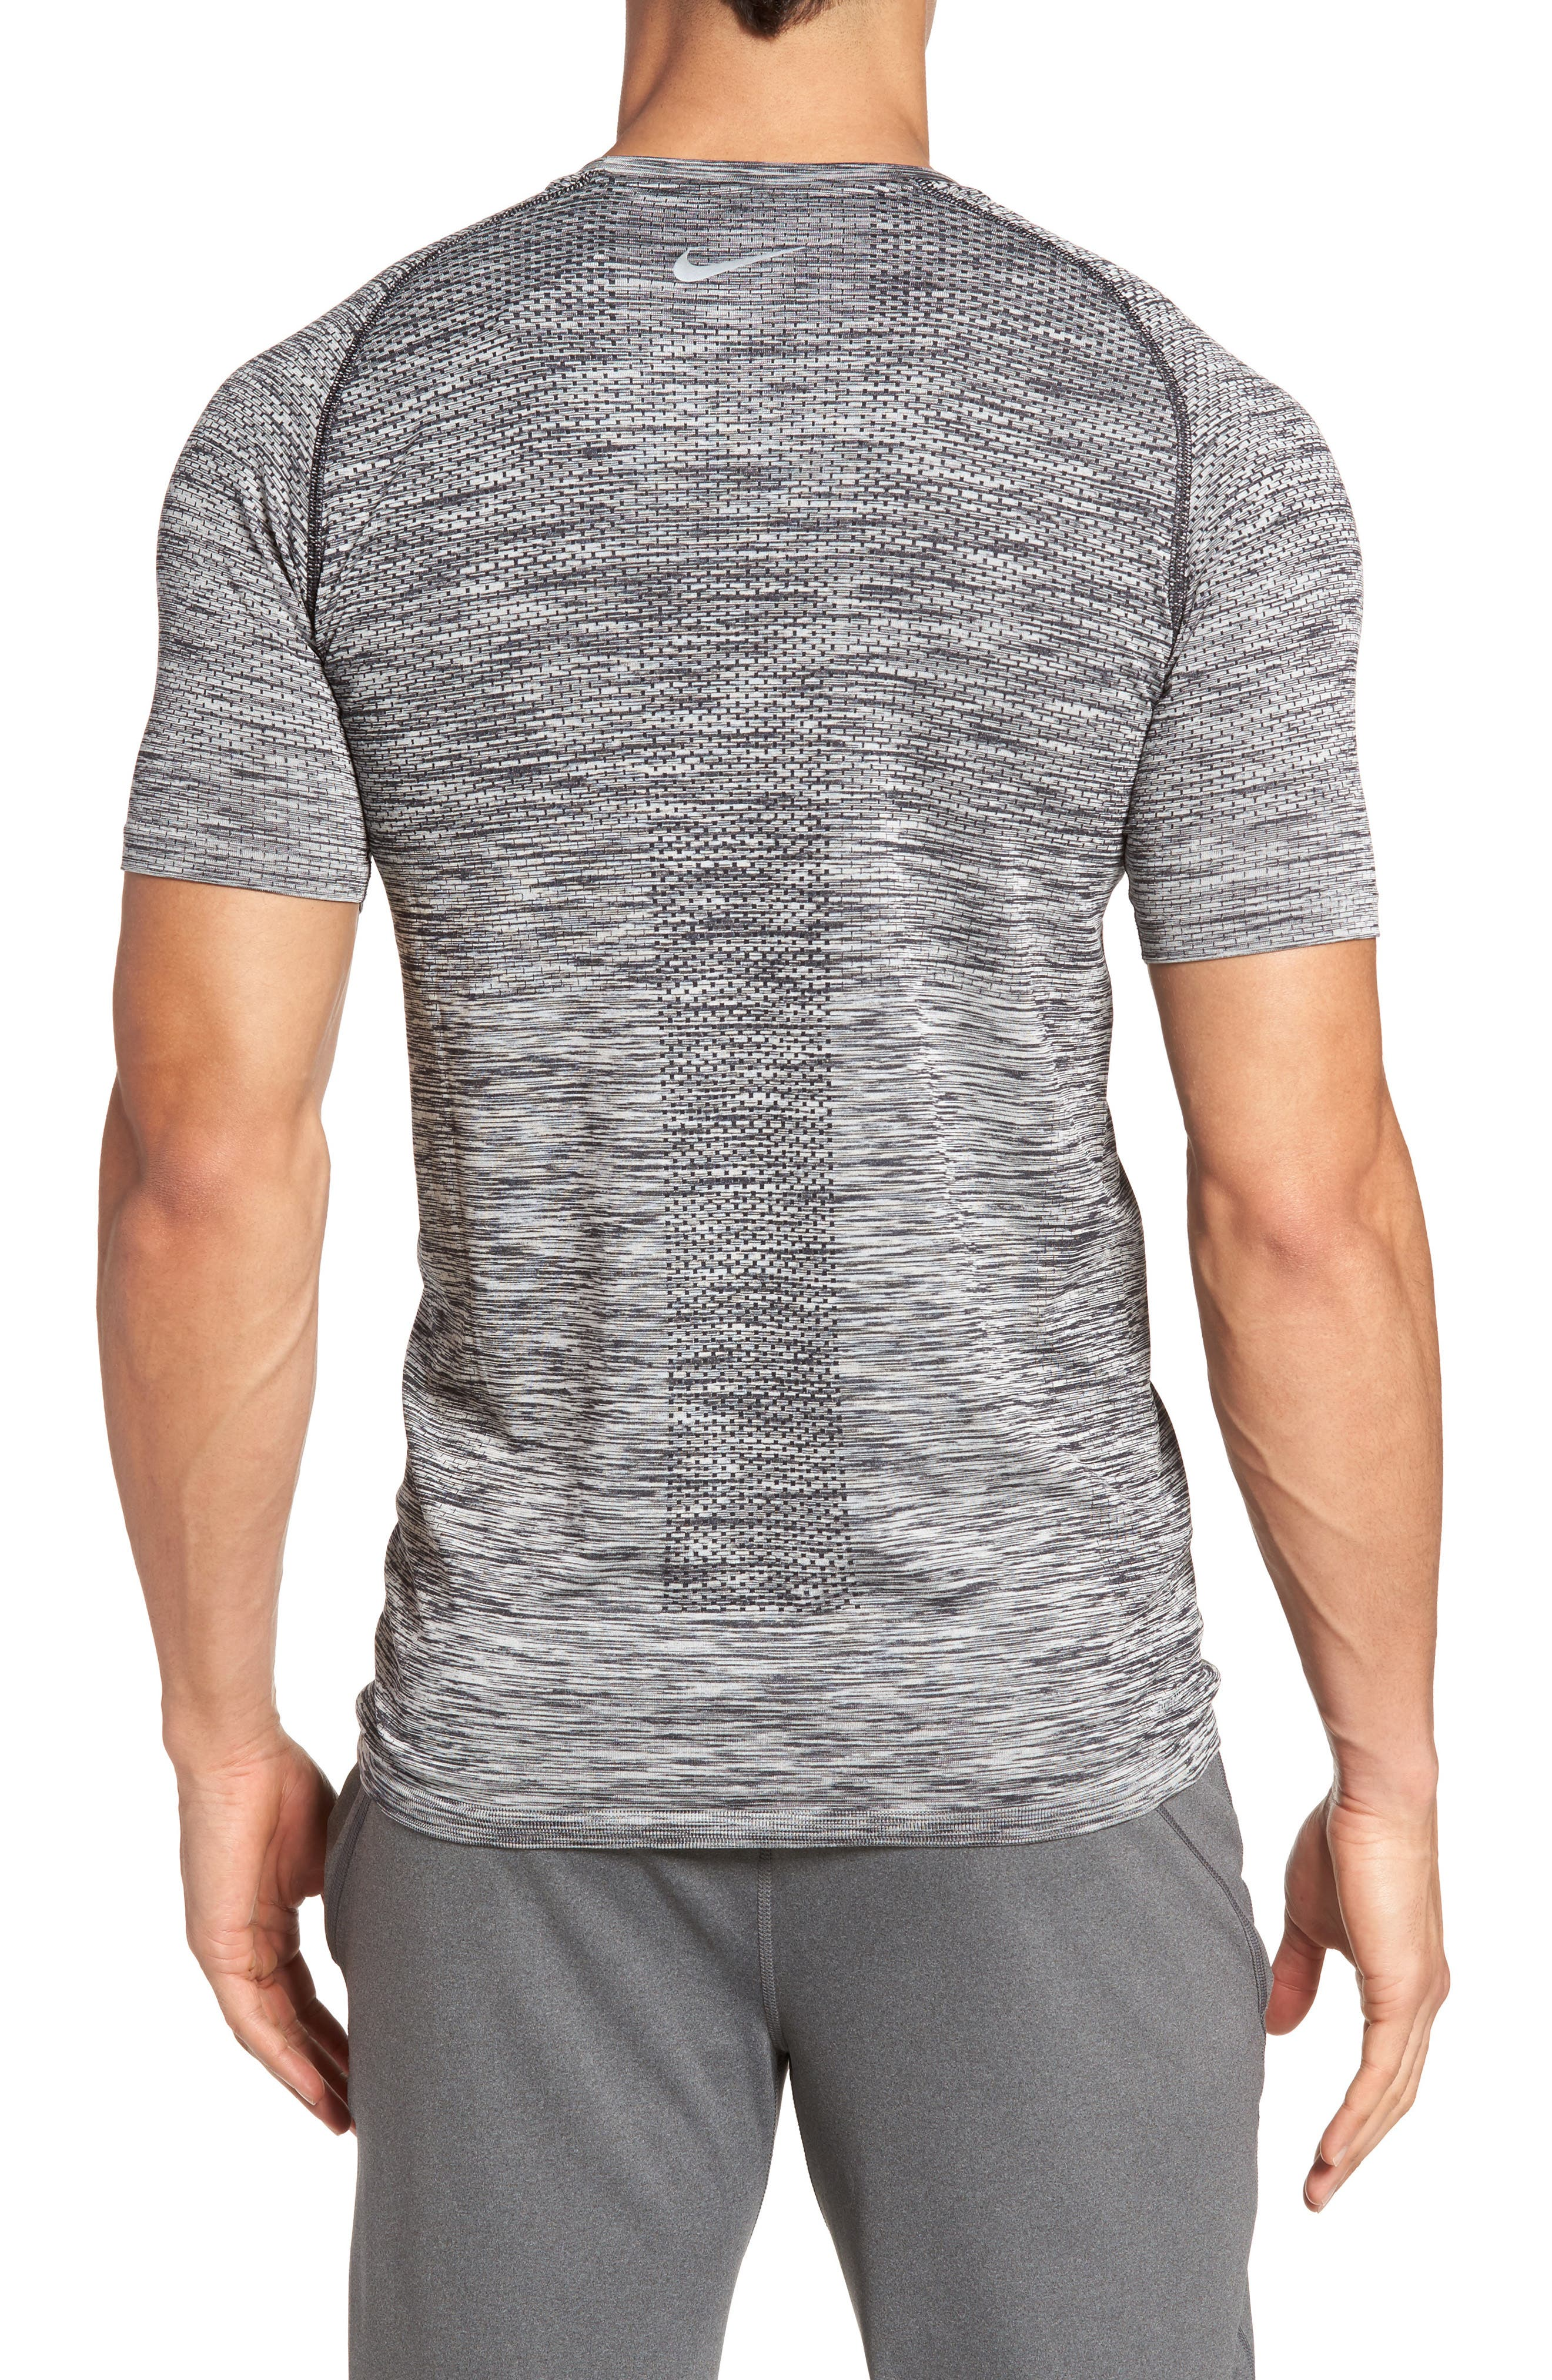 Men Dry Knit Running T-Shirt,                             Alternate thumbnail 2, color,                             Black/ Heather